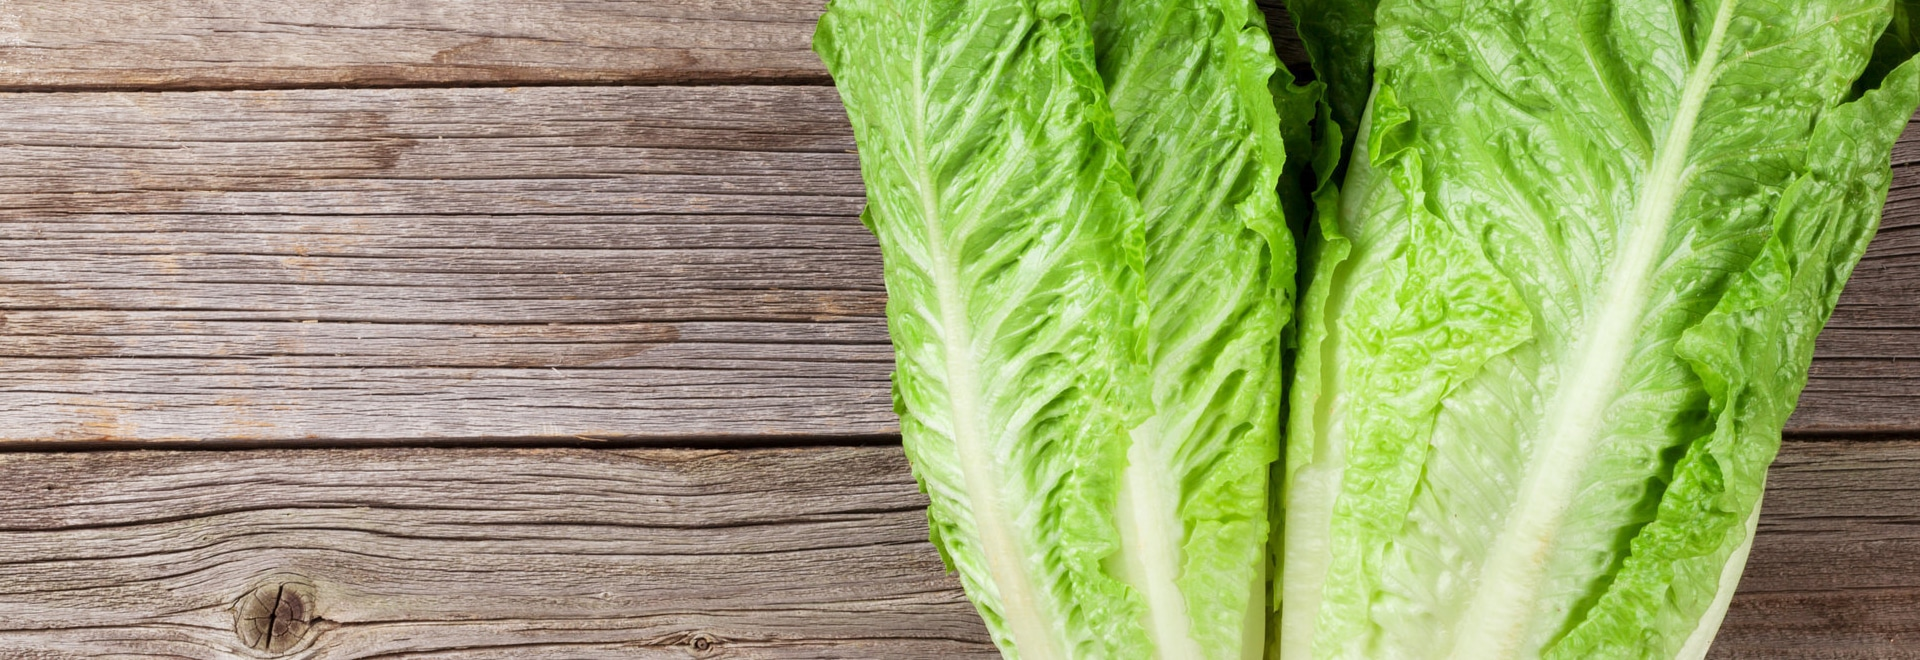 Source of E. Coli in Deadly Romaine Lettuce Outbreak Finally Found